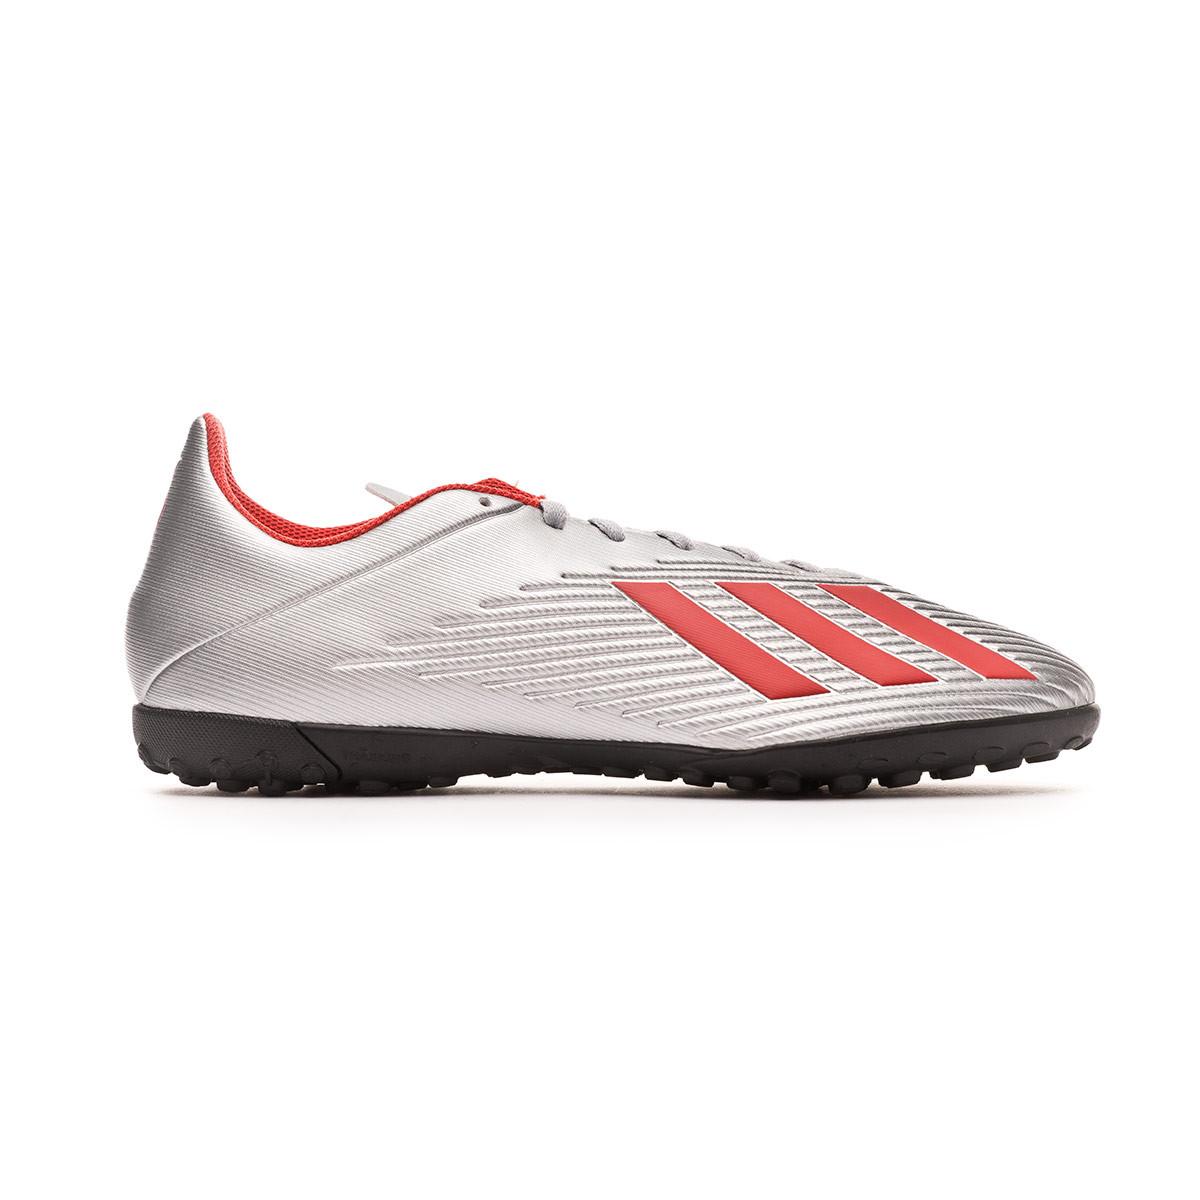 pared Tercero Ser amado  Football Boots adidas X 19.4 Turf Silver metallic-Hi red-White - Football  store Fútbol Emotion